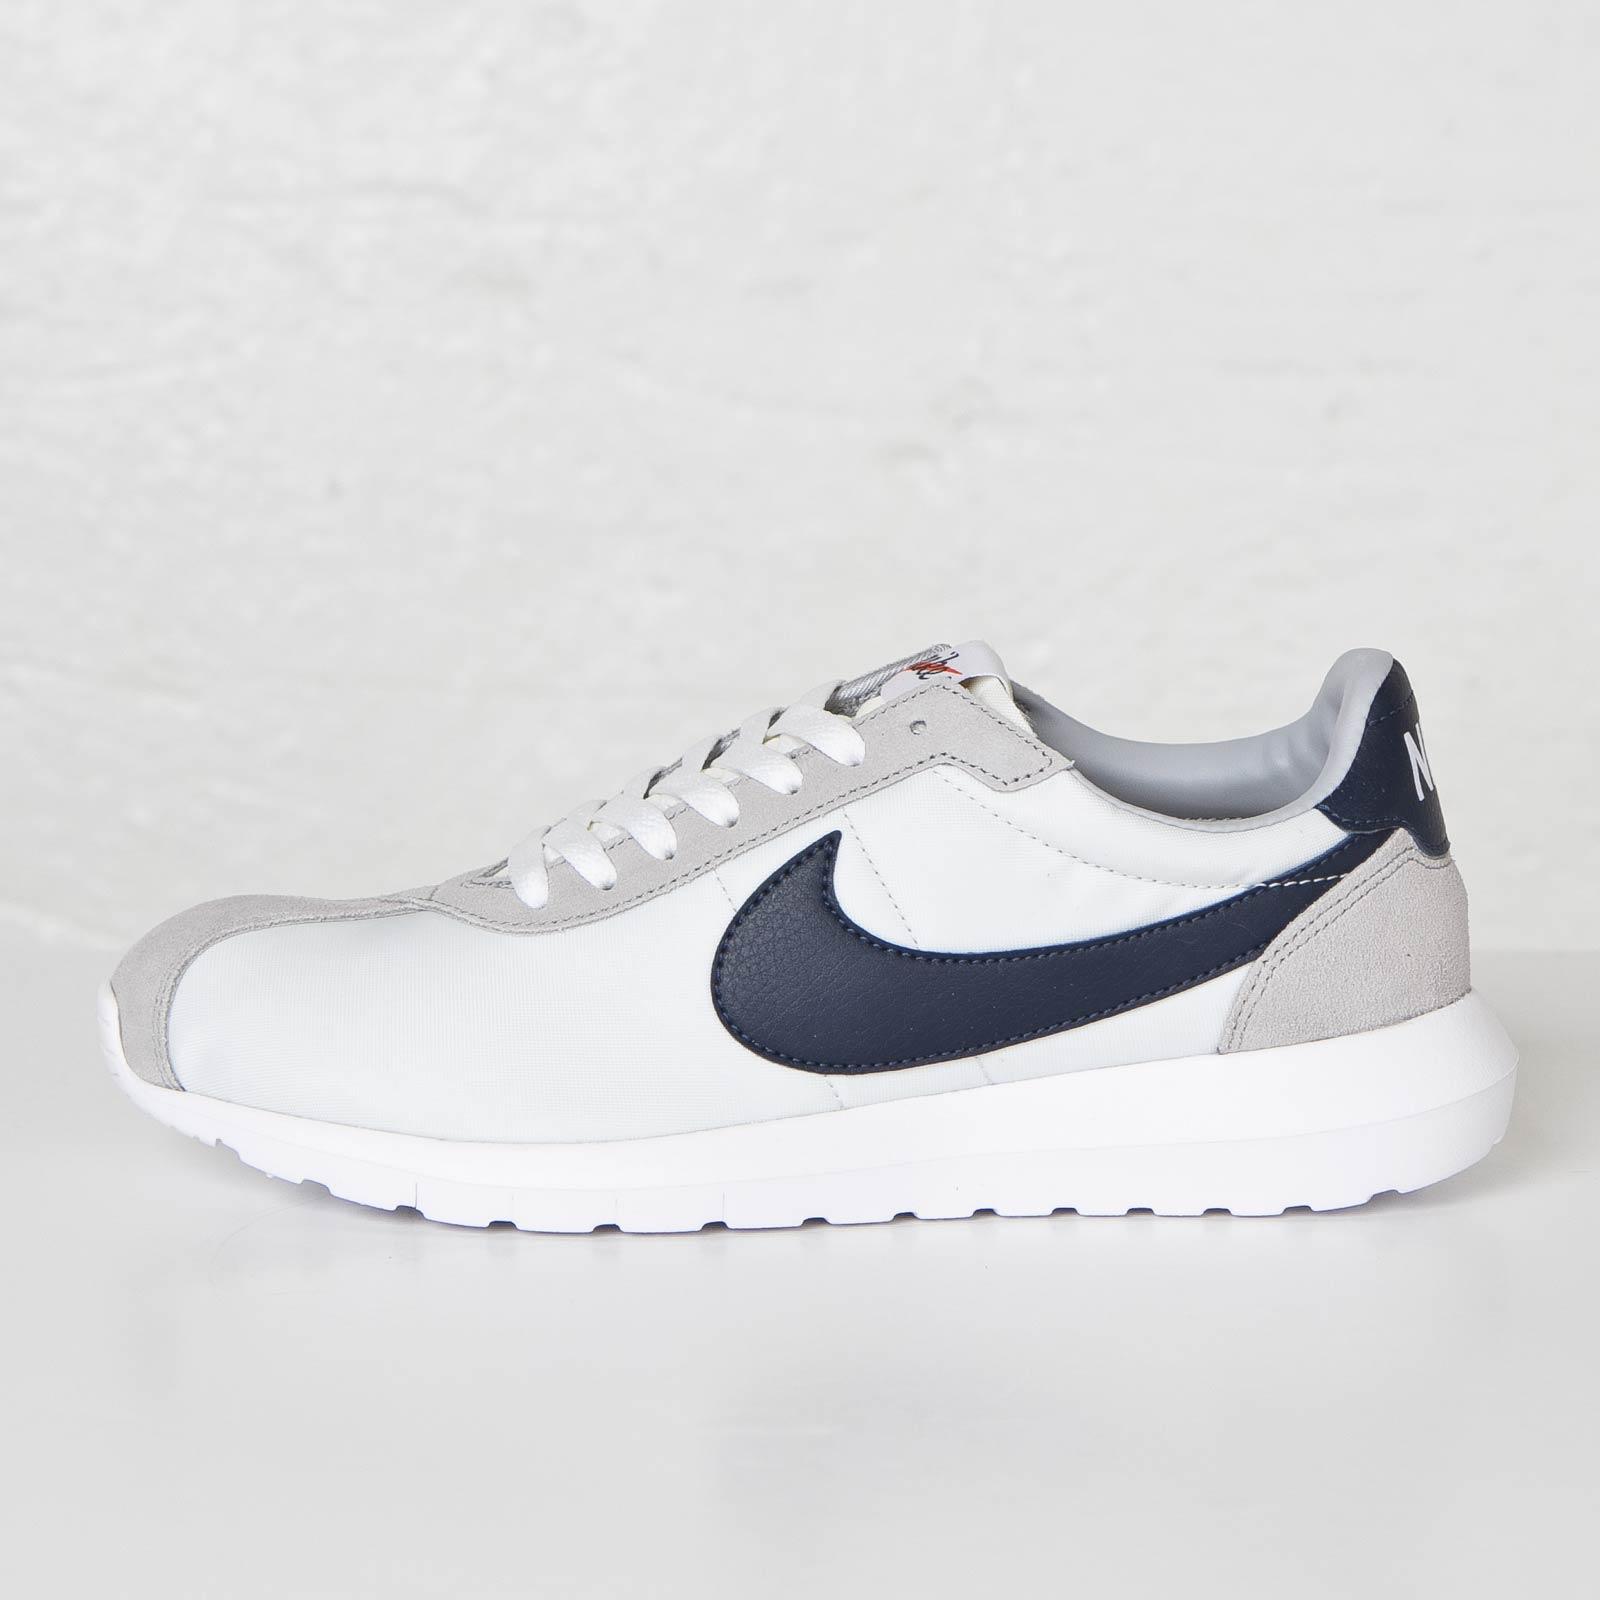 cheap for discount 09b88 149b6 Nike Roshe LD-1000 QS - 802022-002 - Sneakersnstuff   sneakers   streetwear  online since 1999